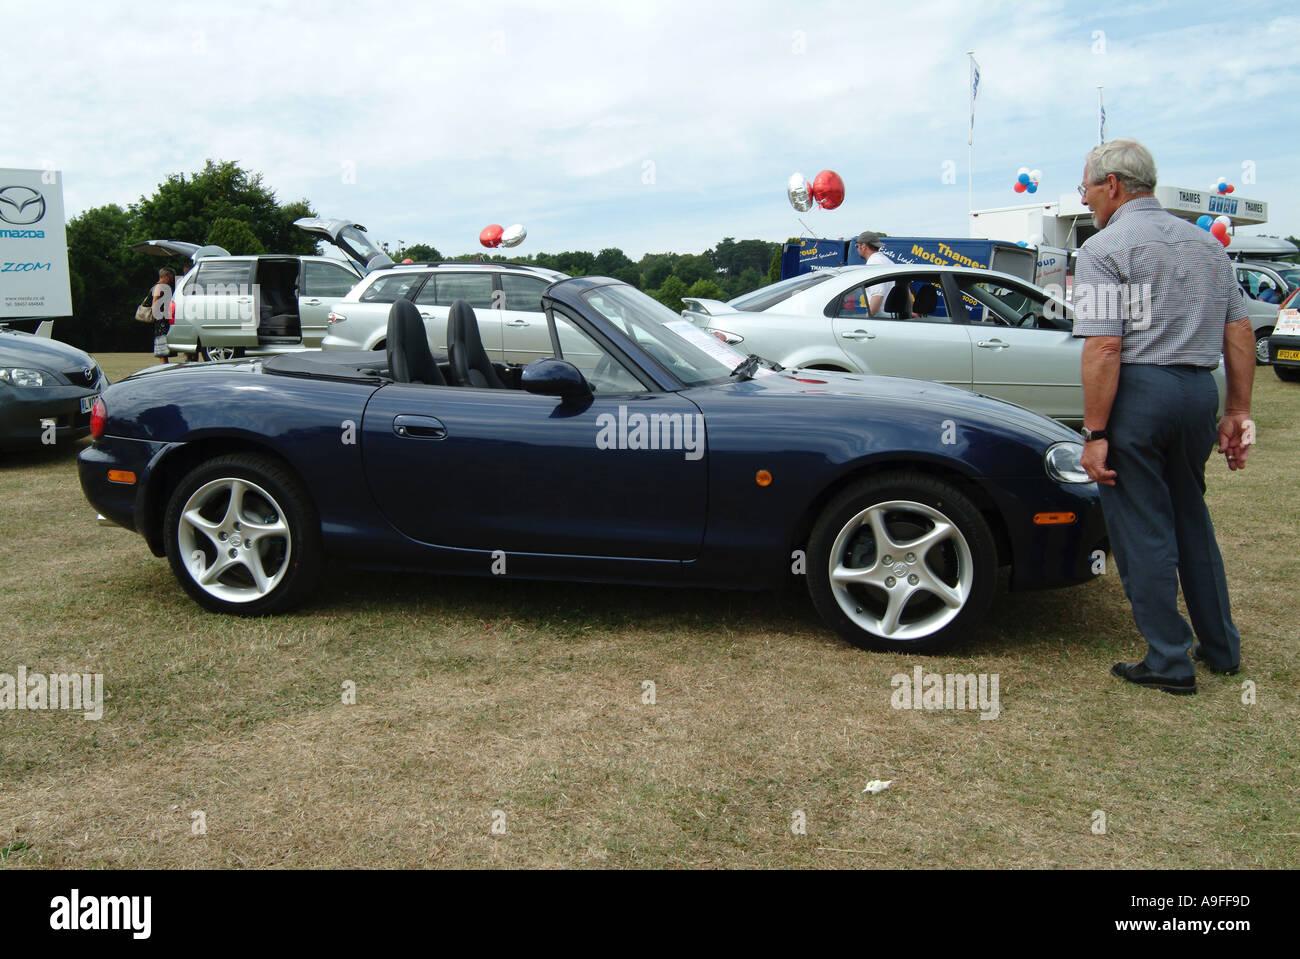 Japan Mazda Mx5 Convertable Sports Car New Car Finance Dealer Show 0